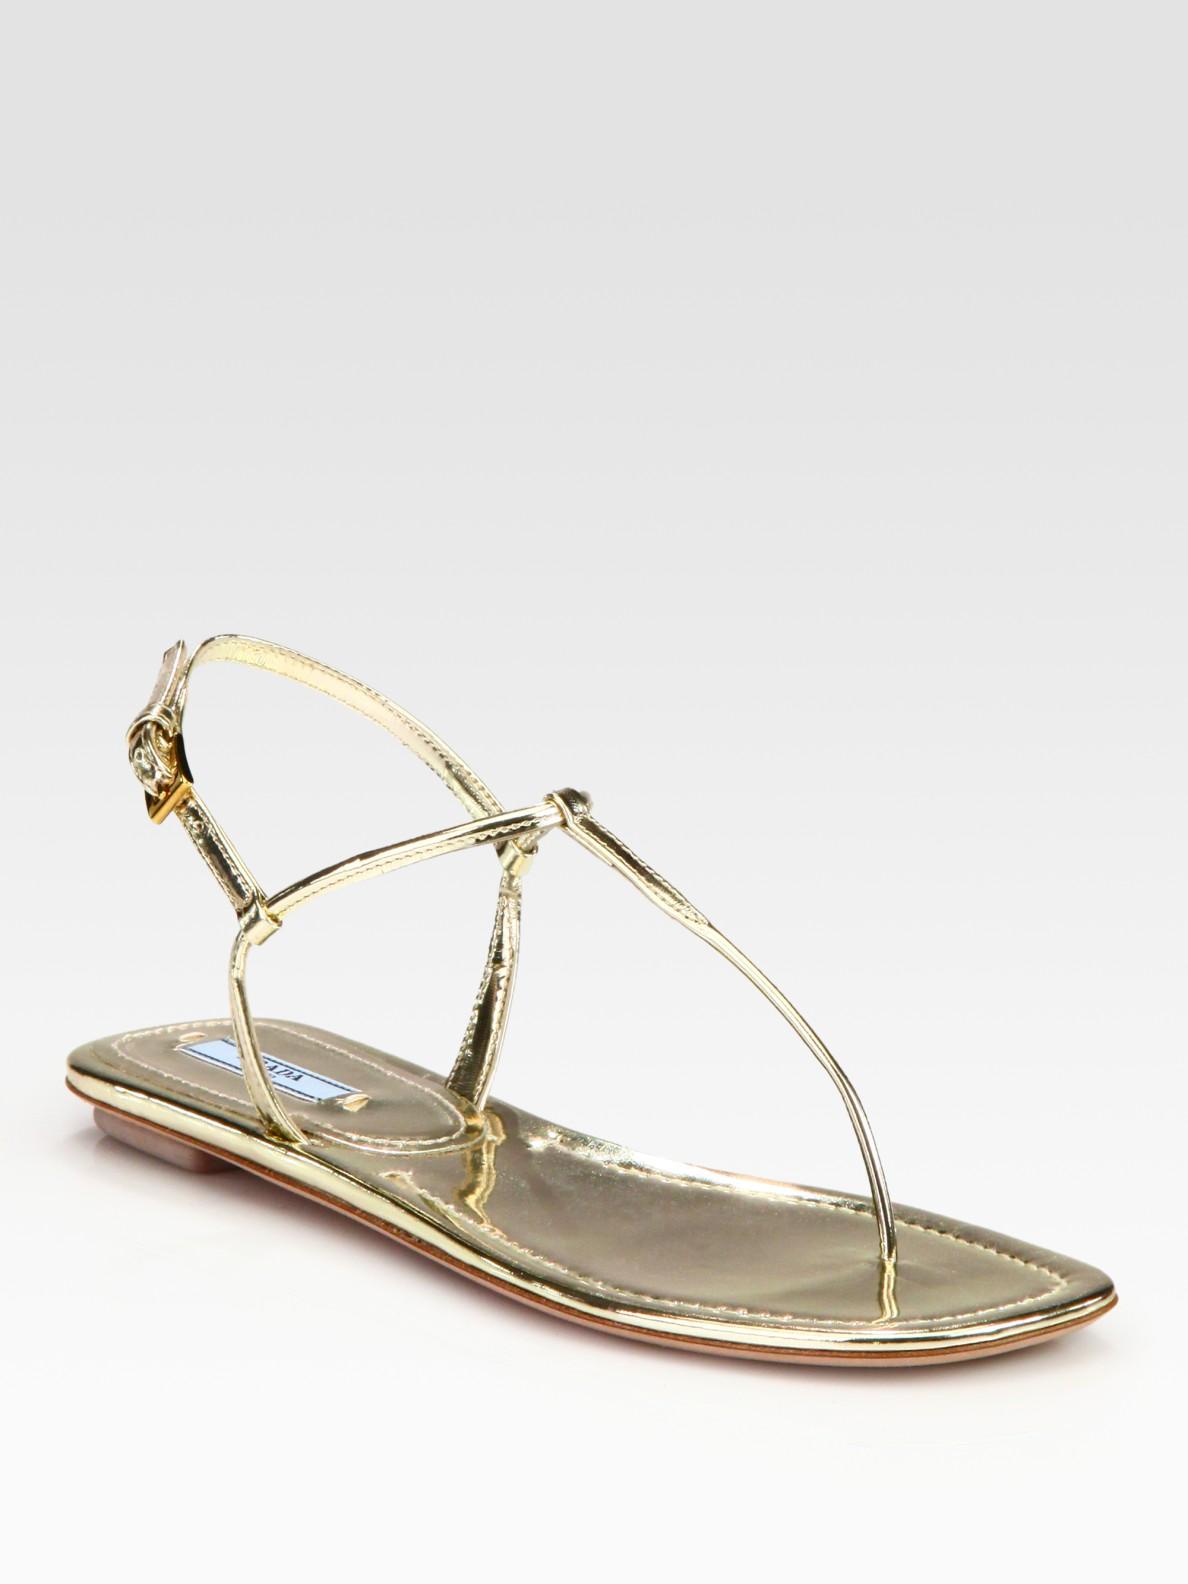 8459e64ad Lyst - Prada Metallic Leather Thong Flat Sandals in Metallic